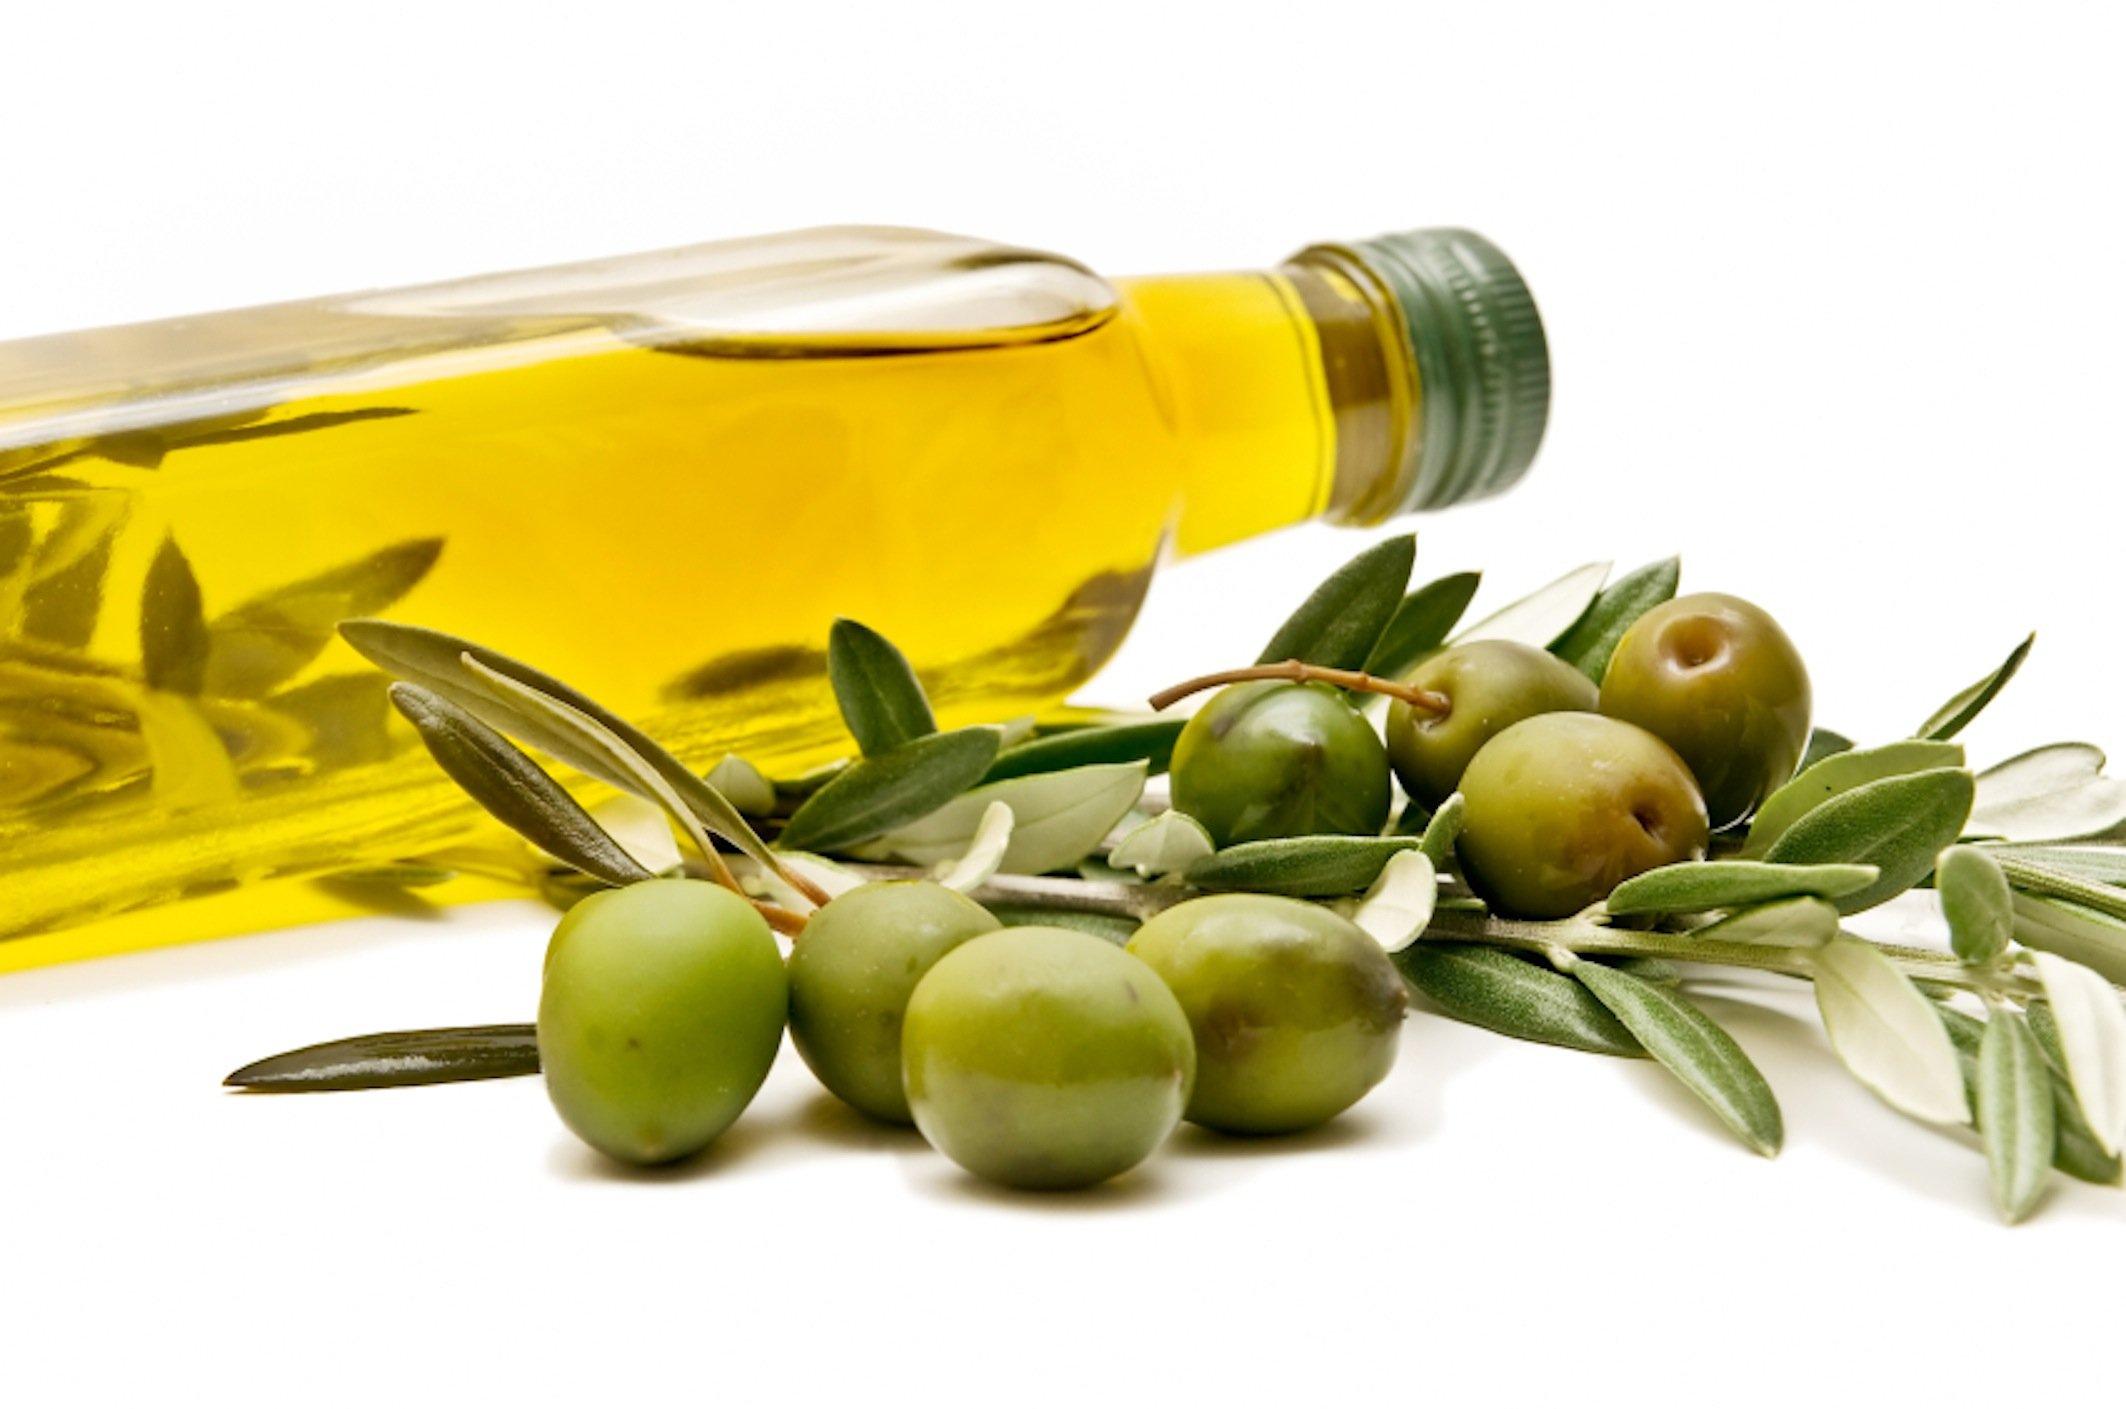 Valori Nutrizionali dell'Olio Extravergine d'Oliva